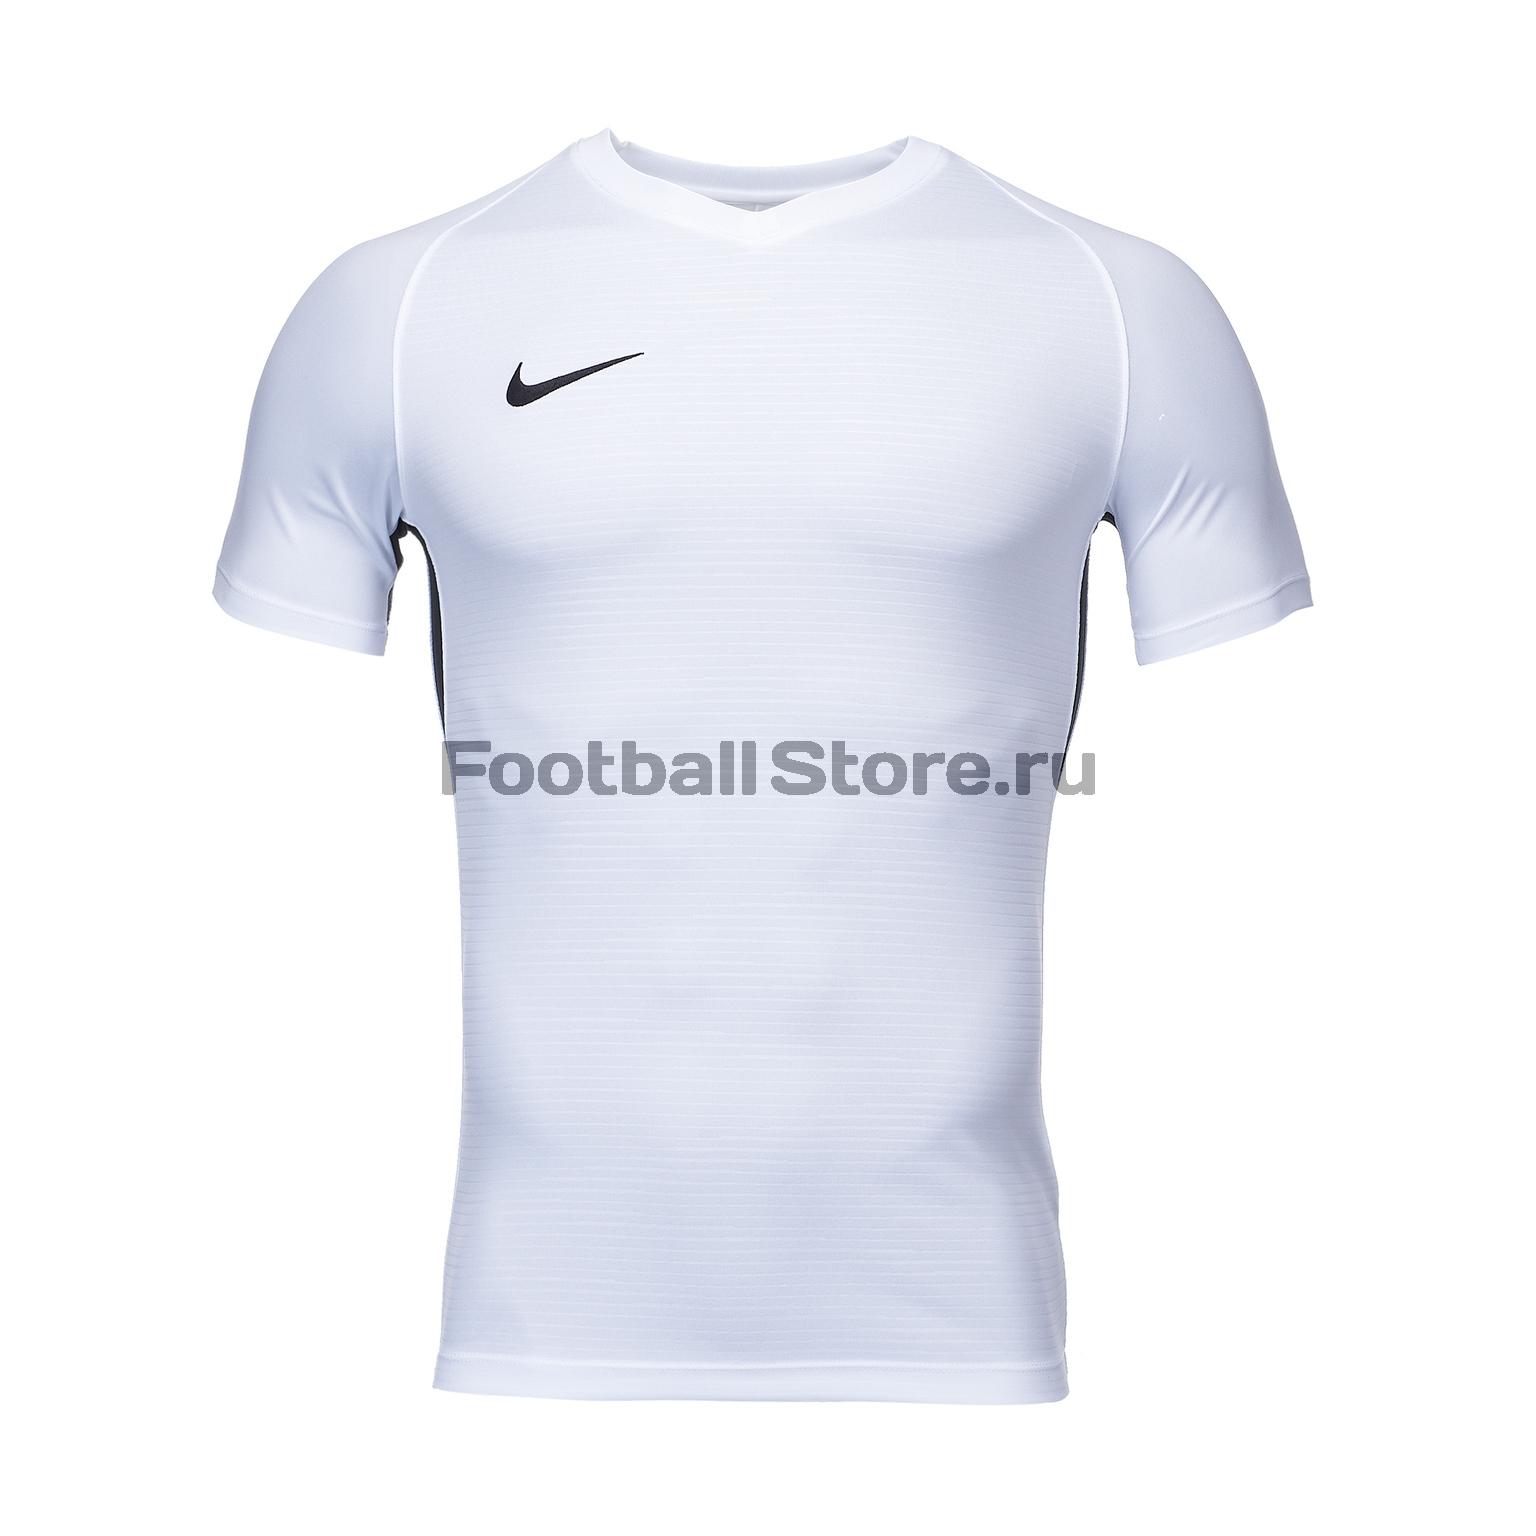 Футболка игровая Nike Dry Tiempo Prem JSY SS 894230-100 nike футболка игровая nike m nk dry acdmy top ss gx 832985 452